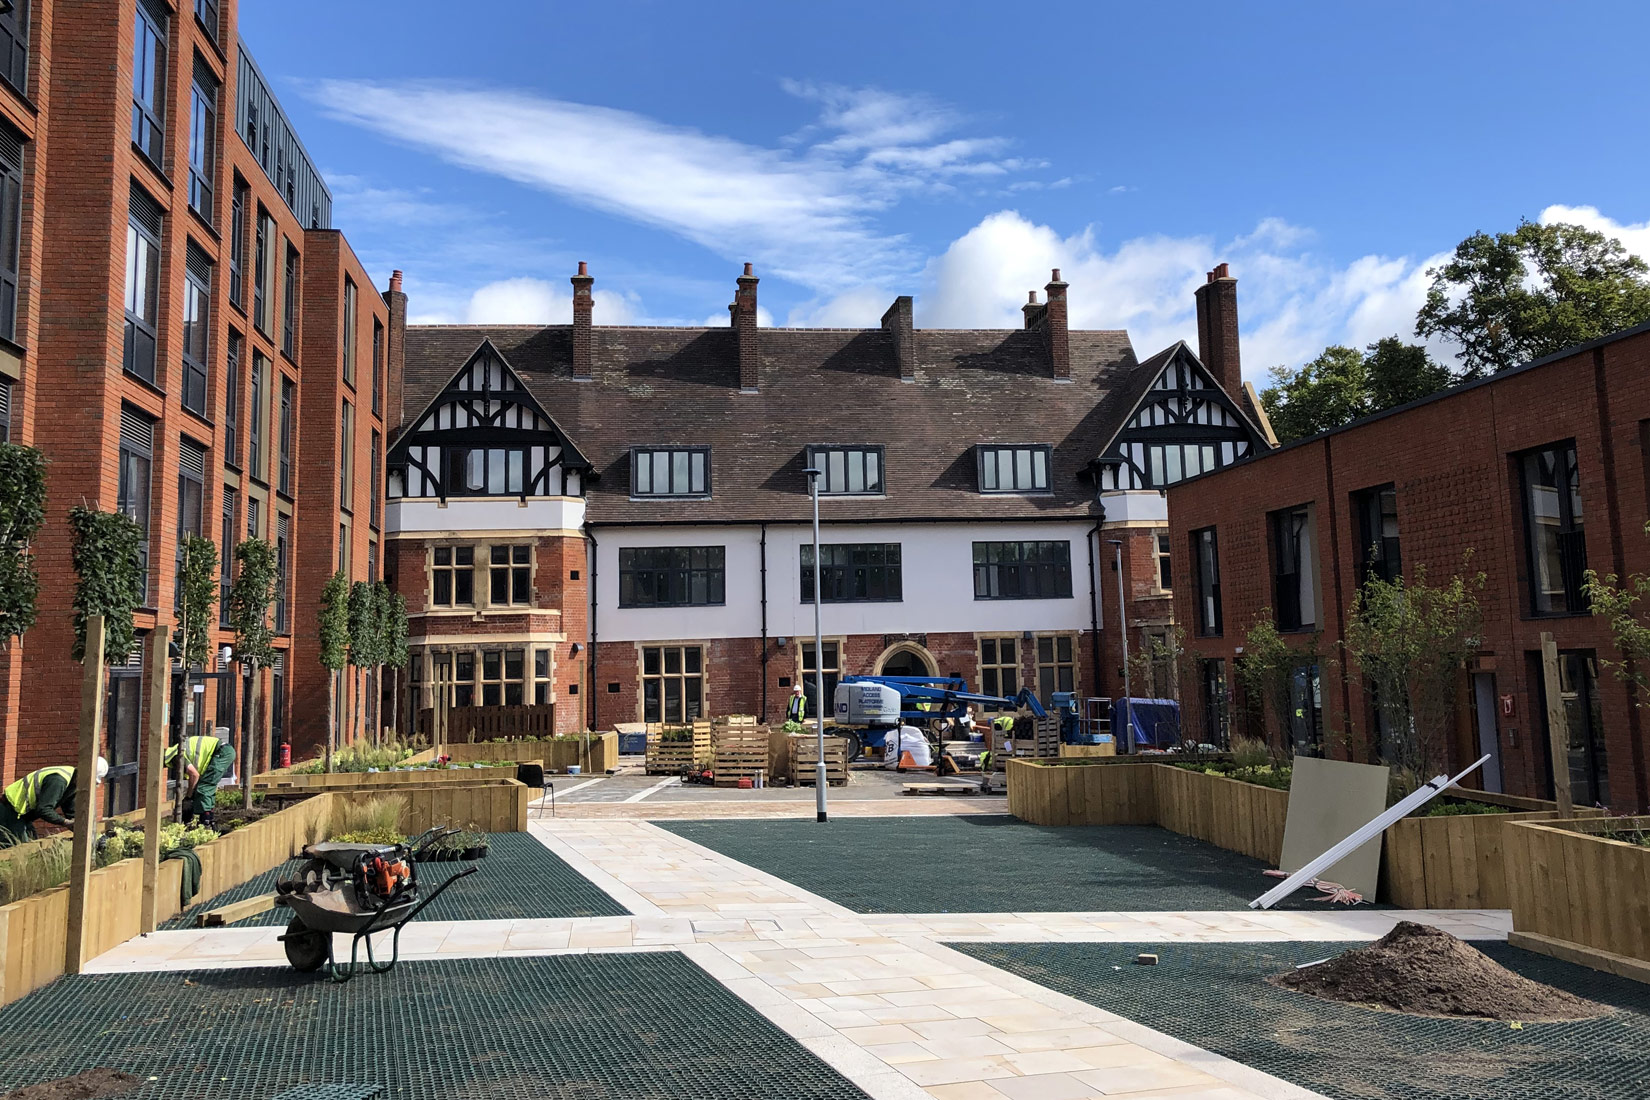 Eden Court, Coventry, onsite